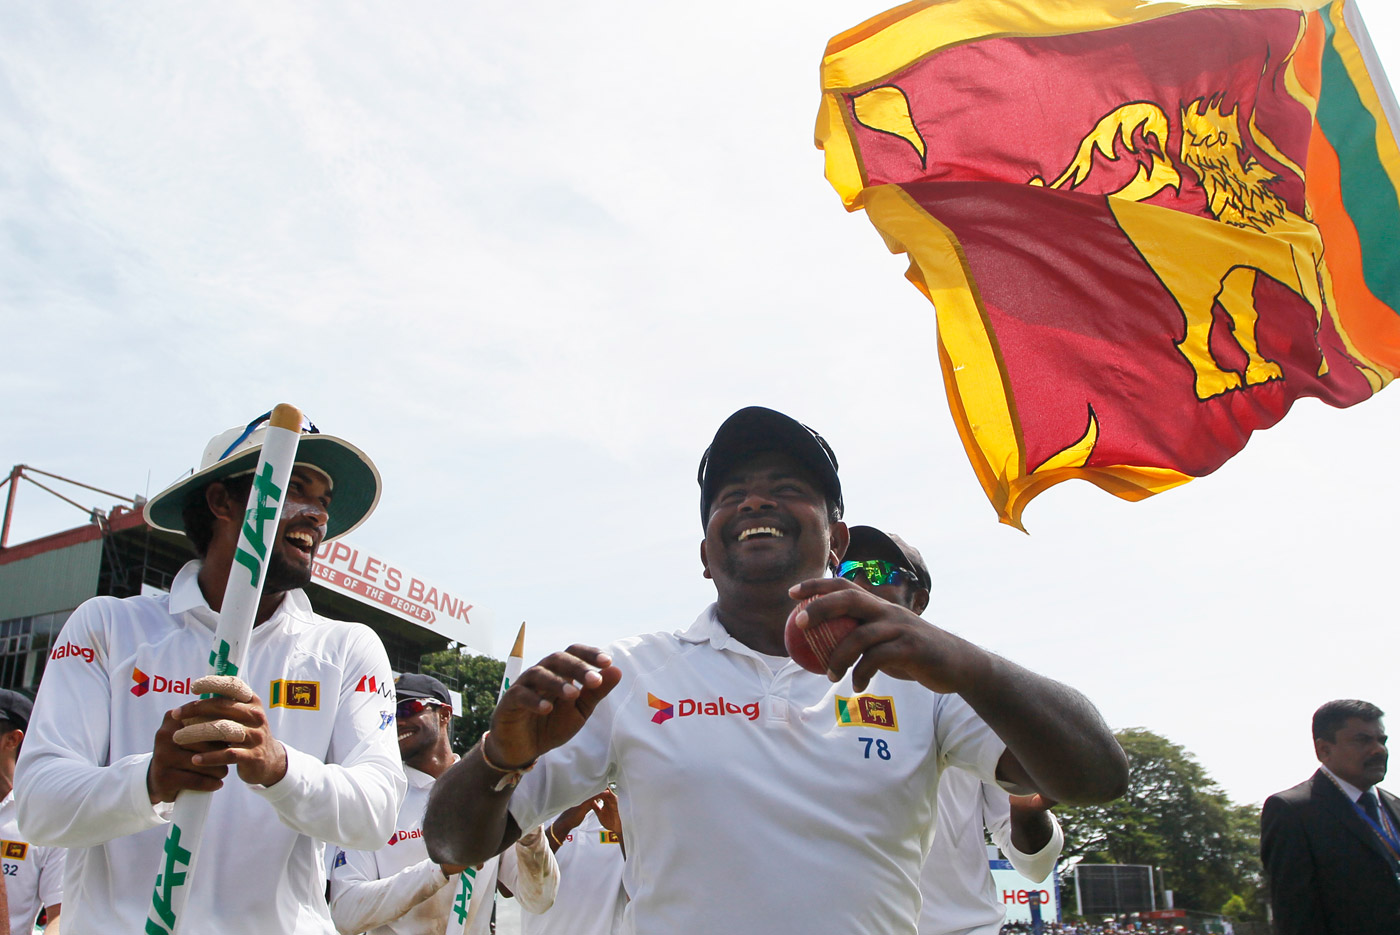 At 38, Sri Lanka's Rangana Herath Set For Captaincy Debut